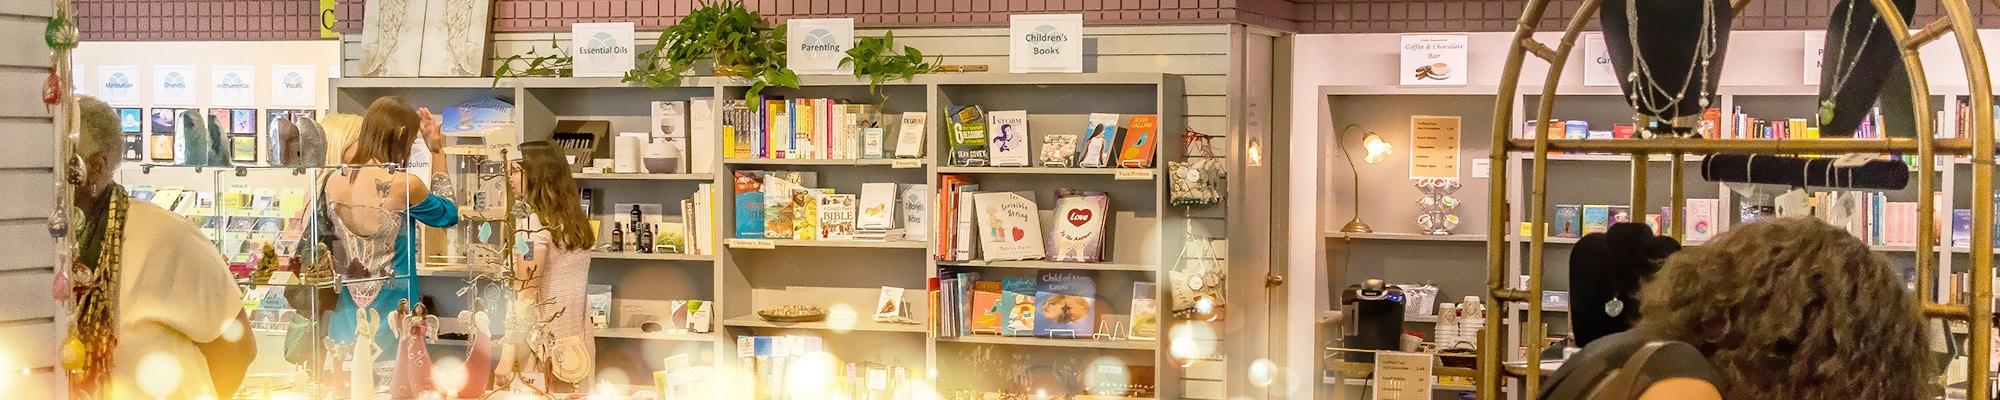 Unity Bookstore